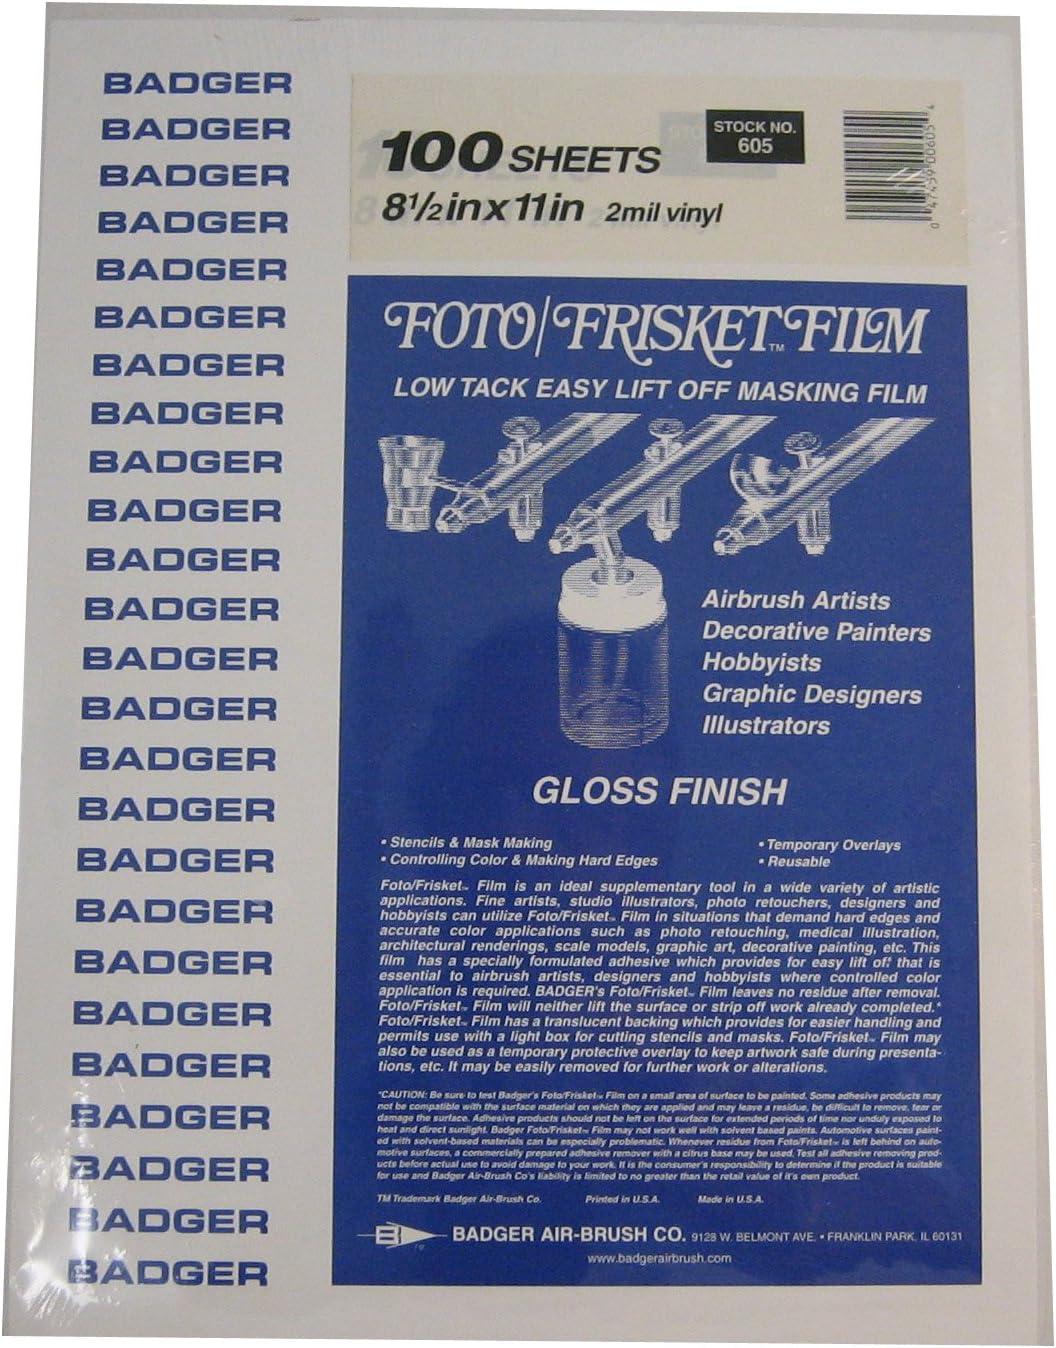 Badger Air-Brush Co. 605 Film Foto Gloss Bargain Max 68% OFF Frisket